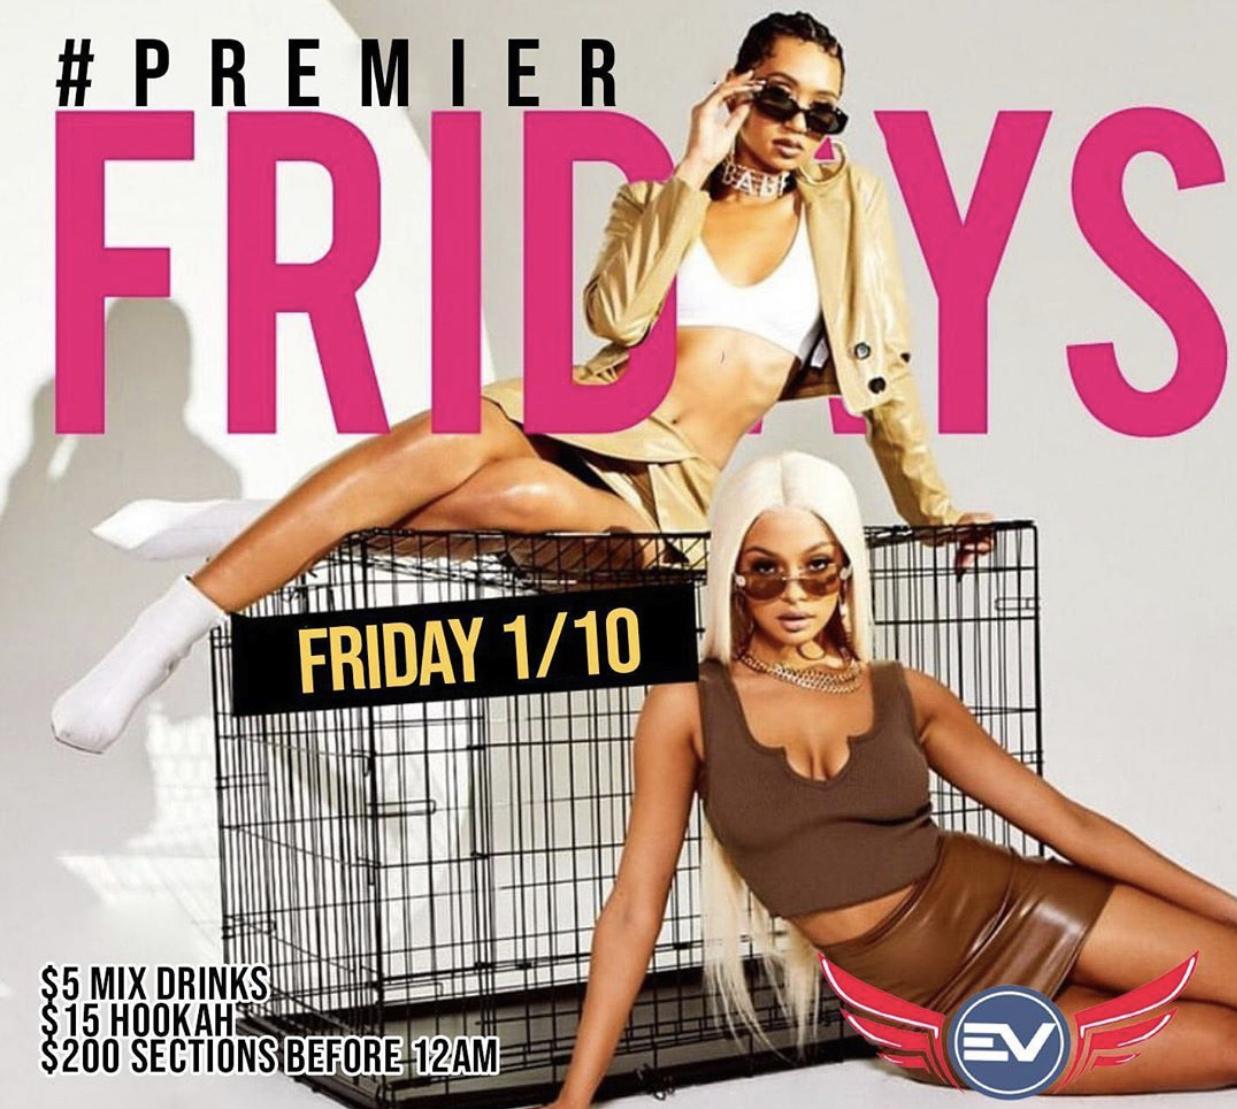 #Premier Fridays